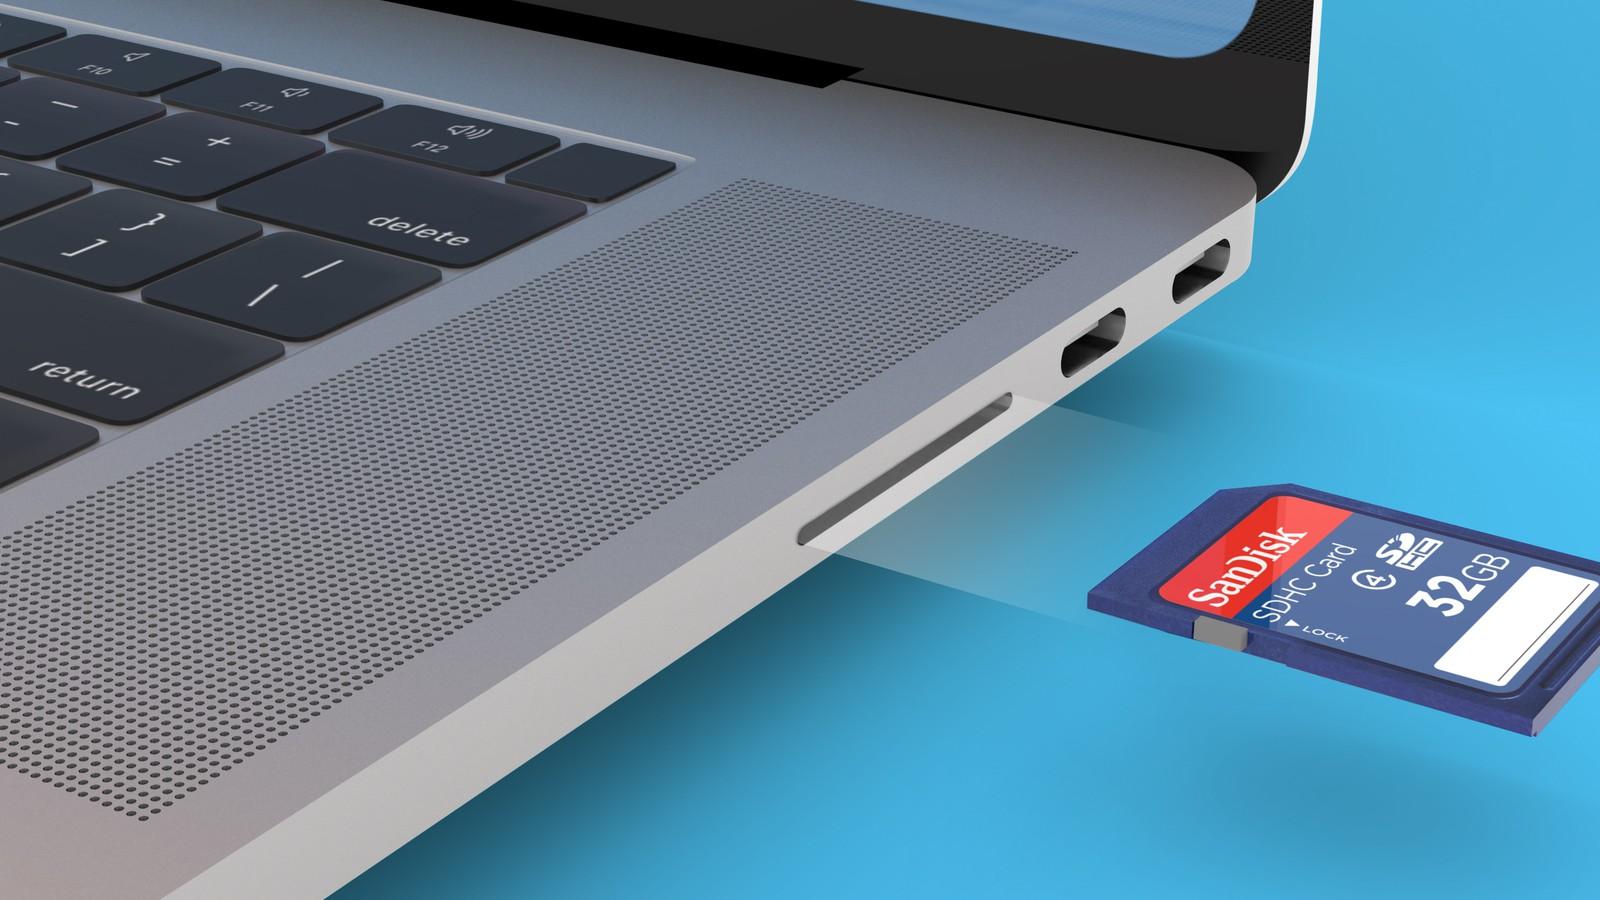 M1X MacBook Pro